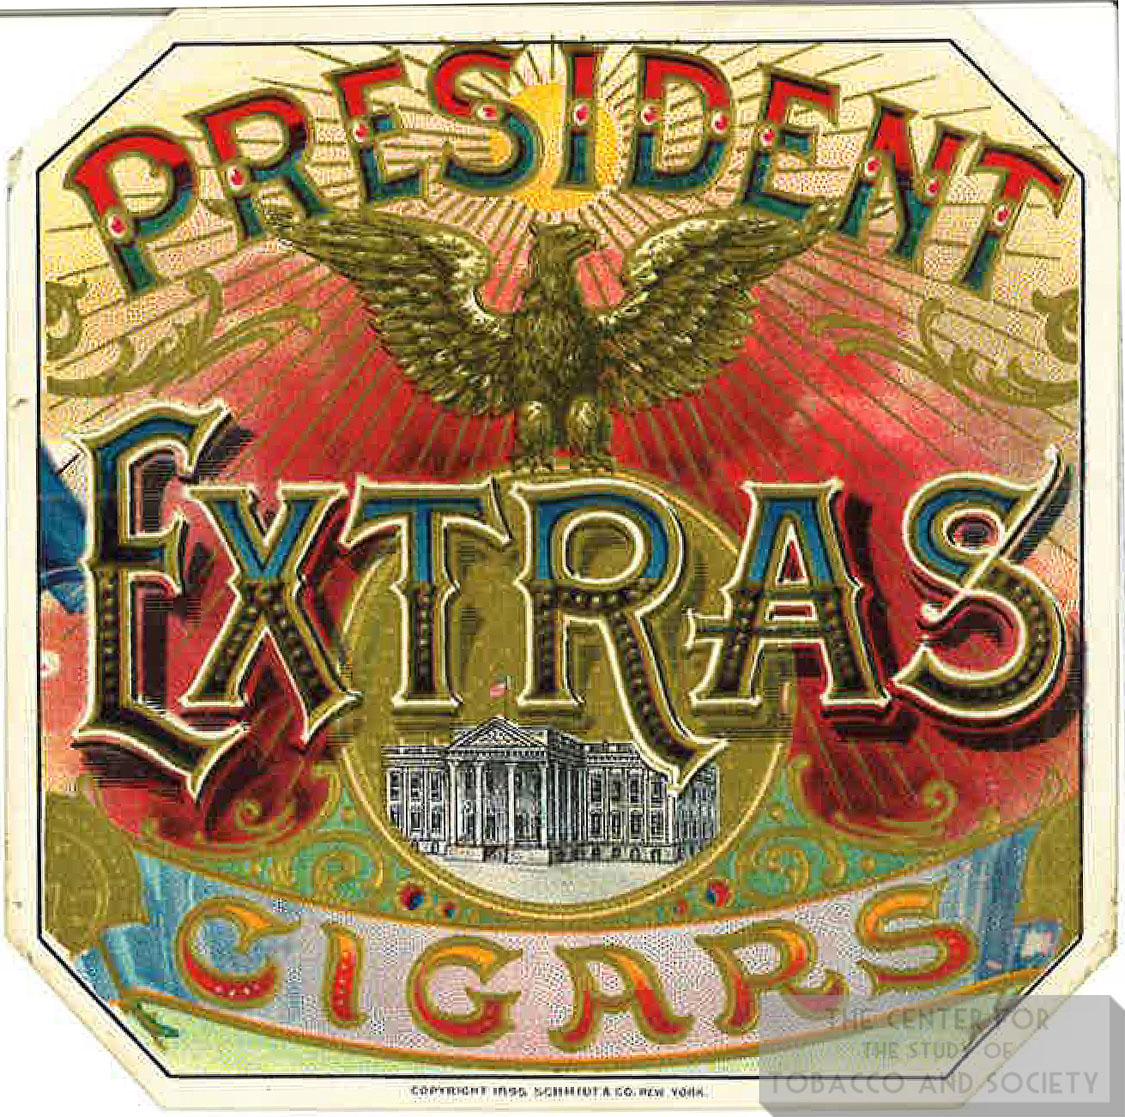 Cigar Box Label President Extras 1